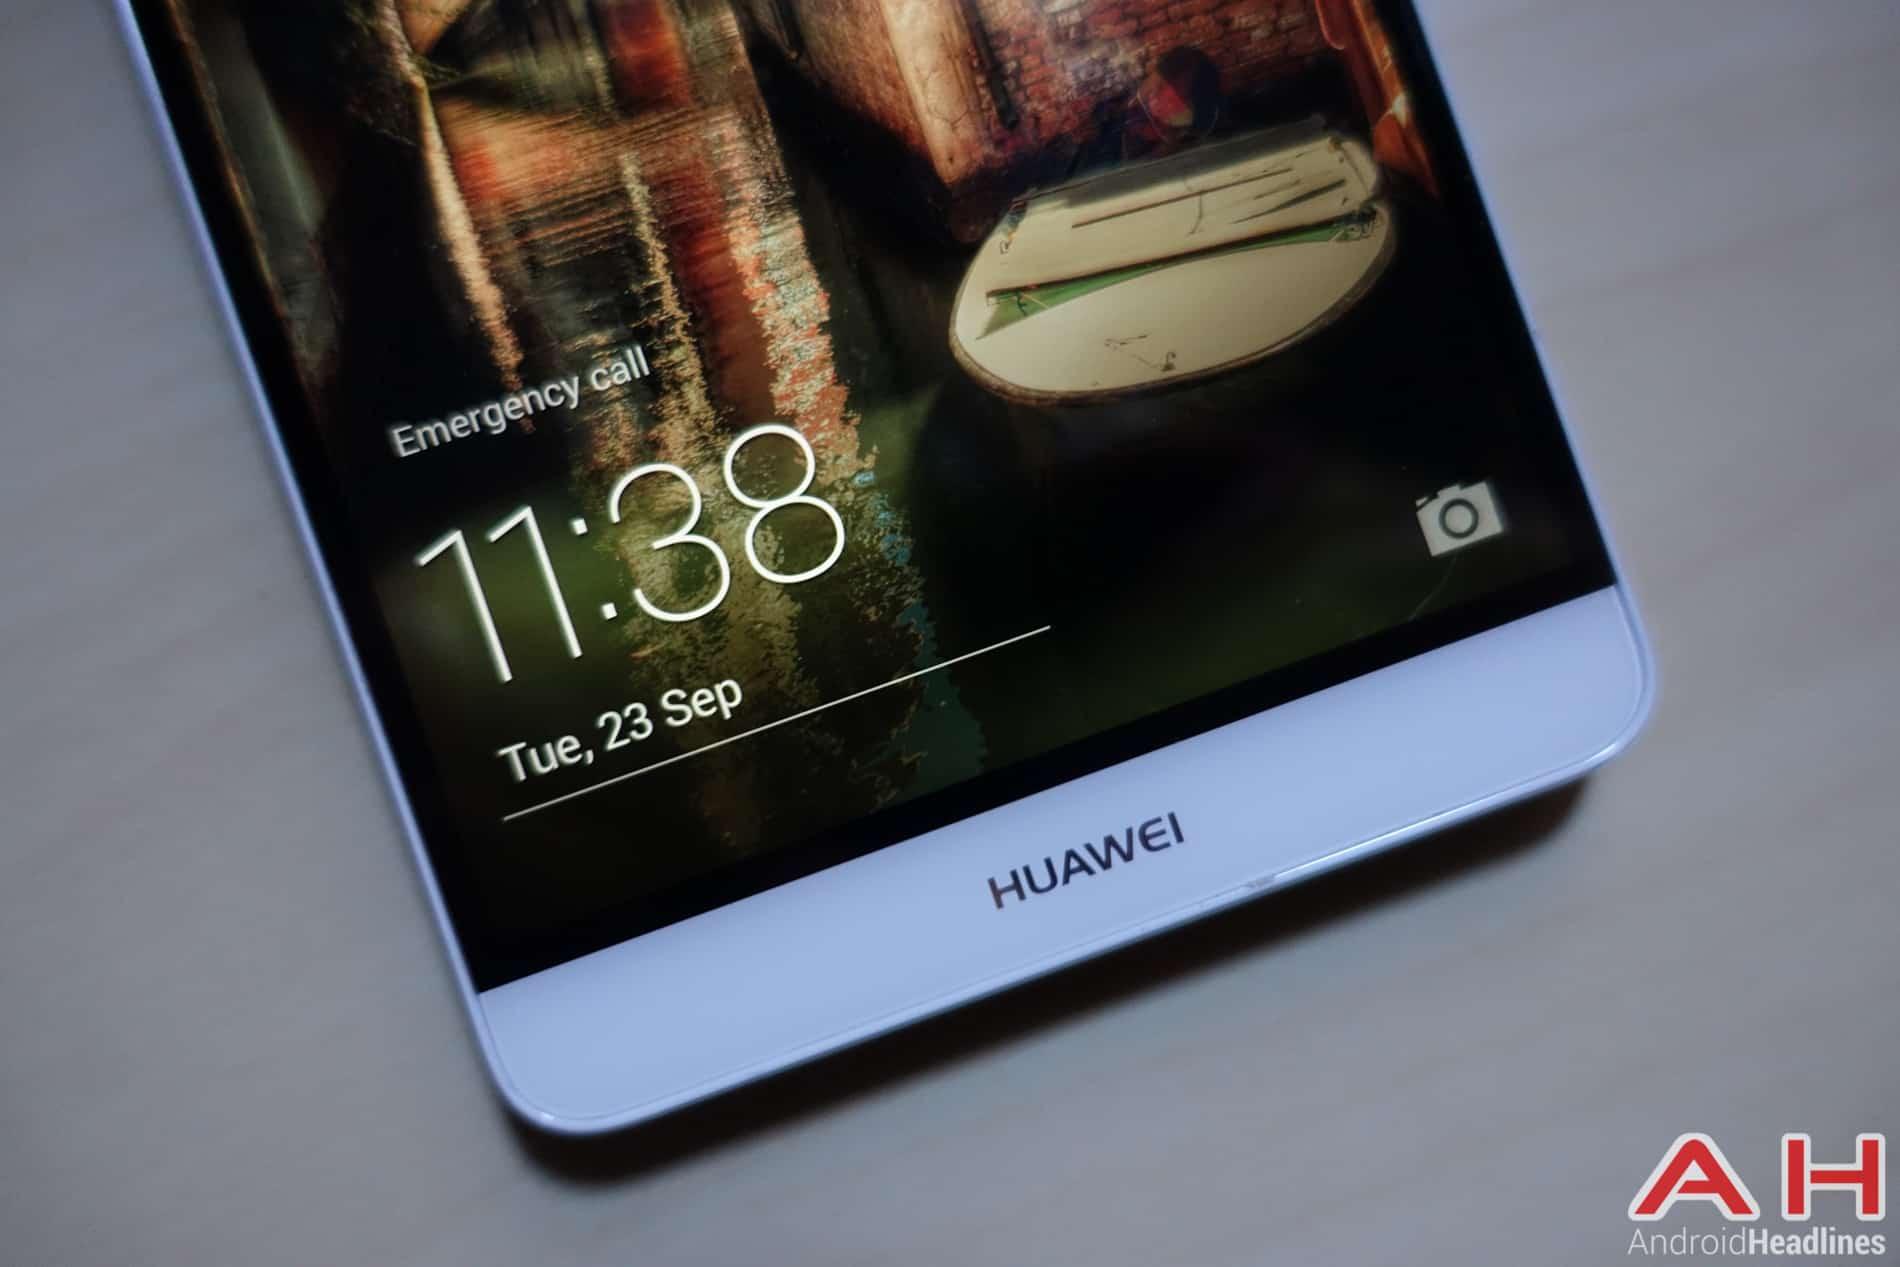 Huawei Ascend Mate 7 AH 10